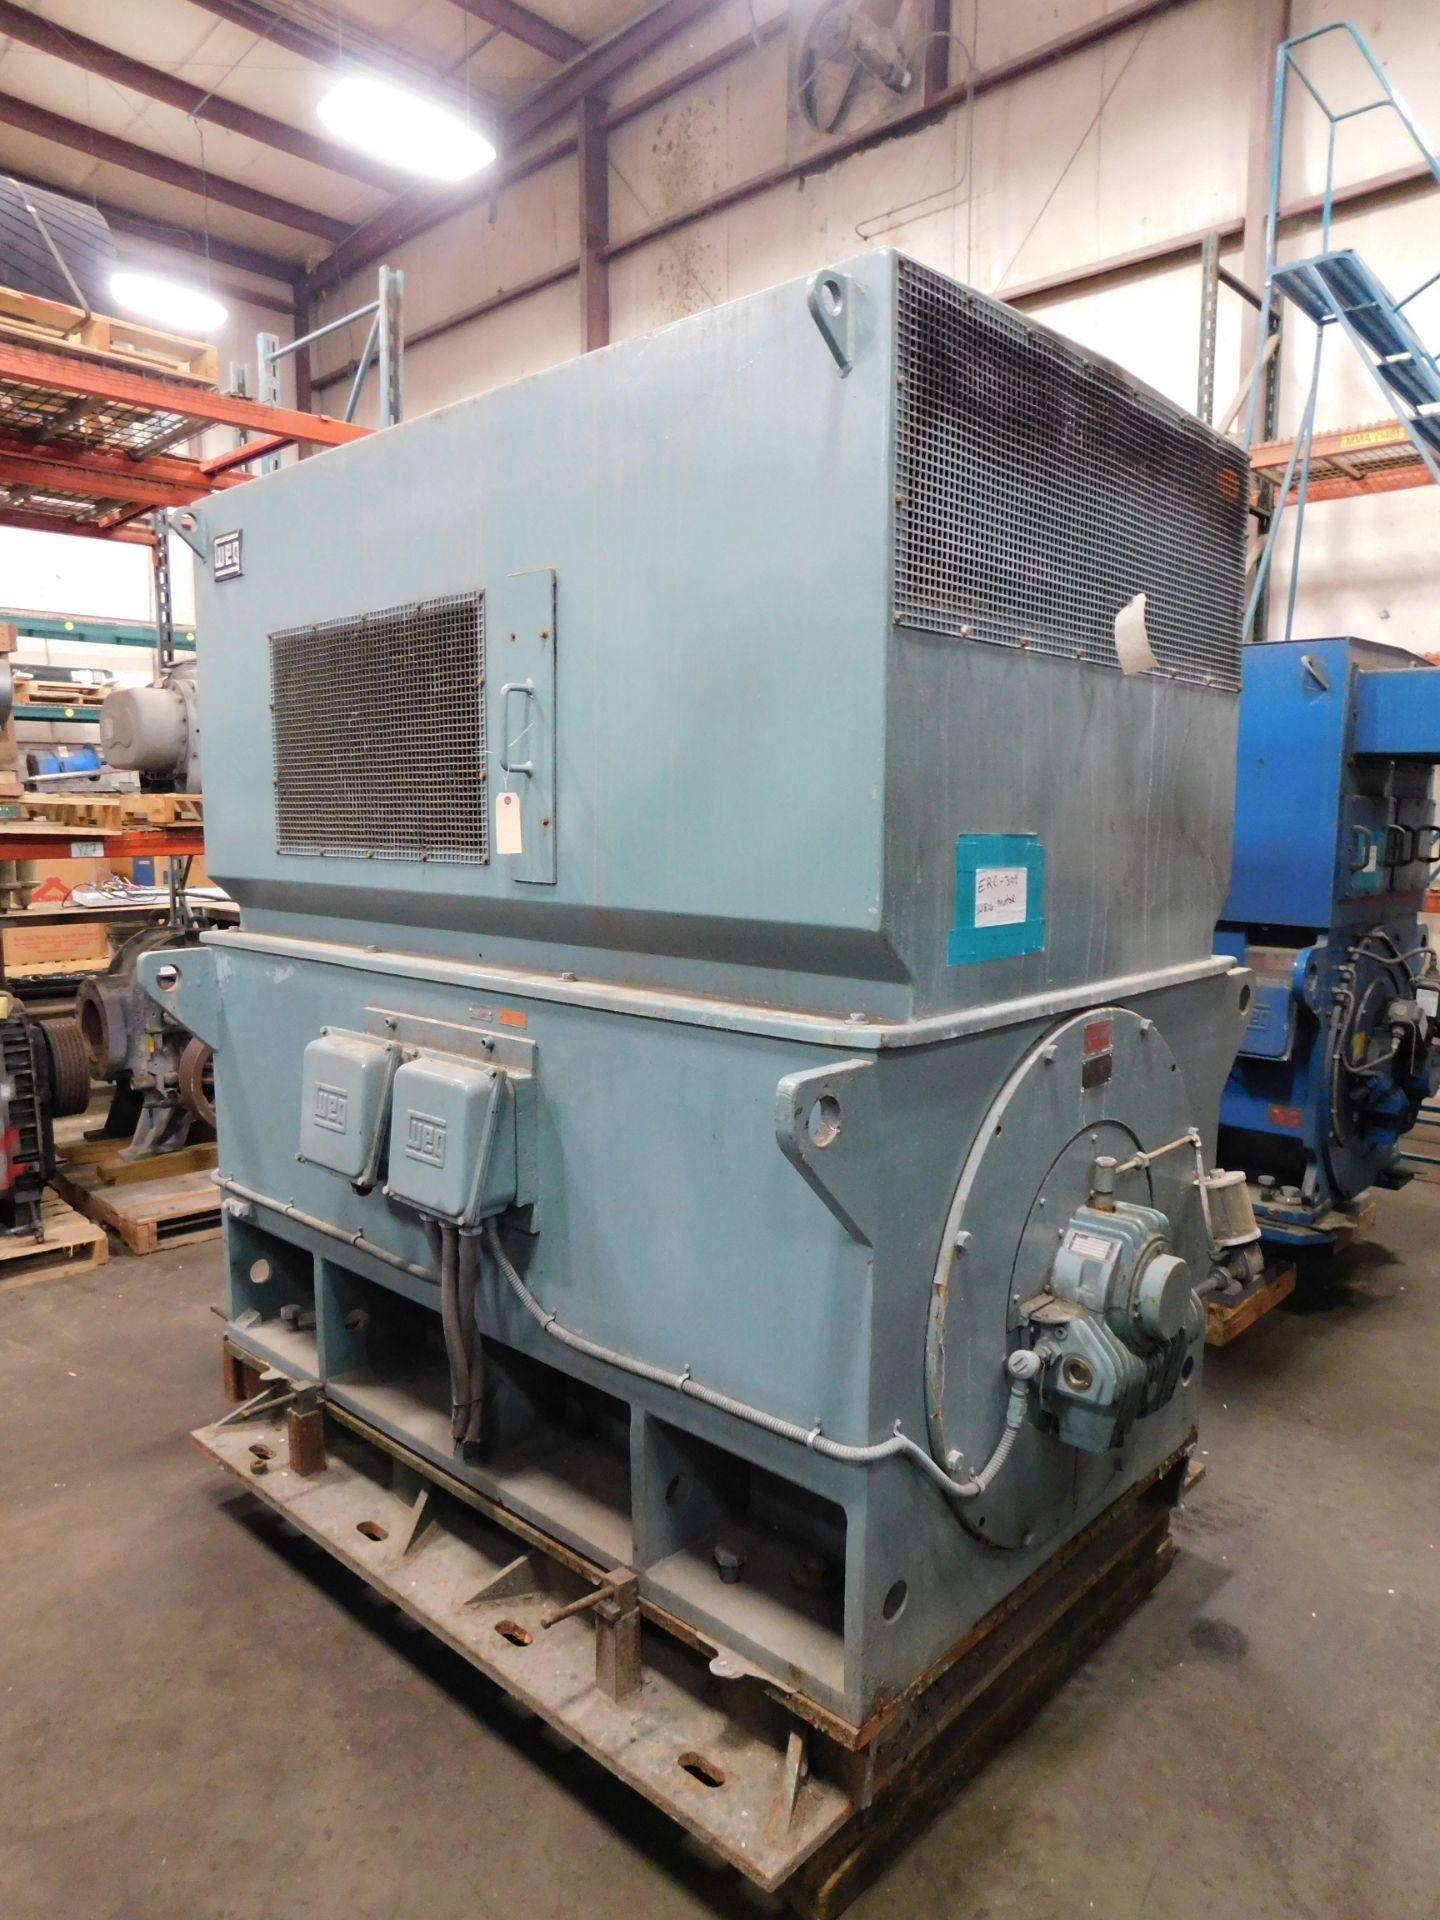 Weg Induction Motor. 2750 HP. 3 Ph. 4000 V. 3582 RPM. 1PW24. MGP 8011. 60 Hz. - Image 2 of 7